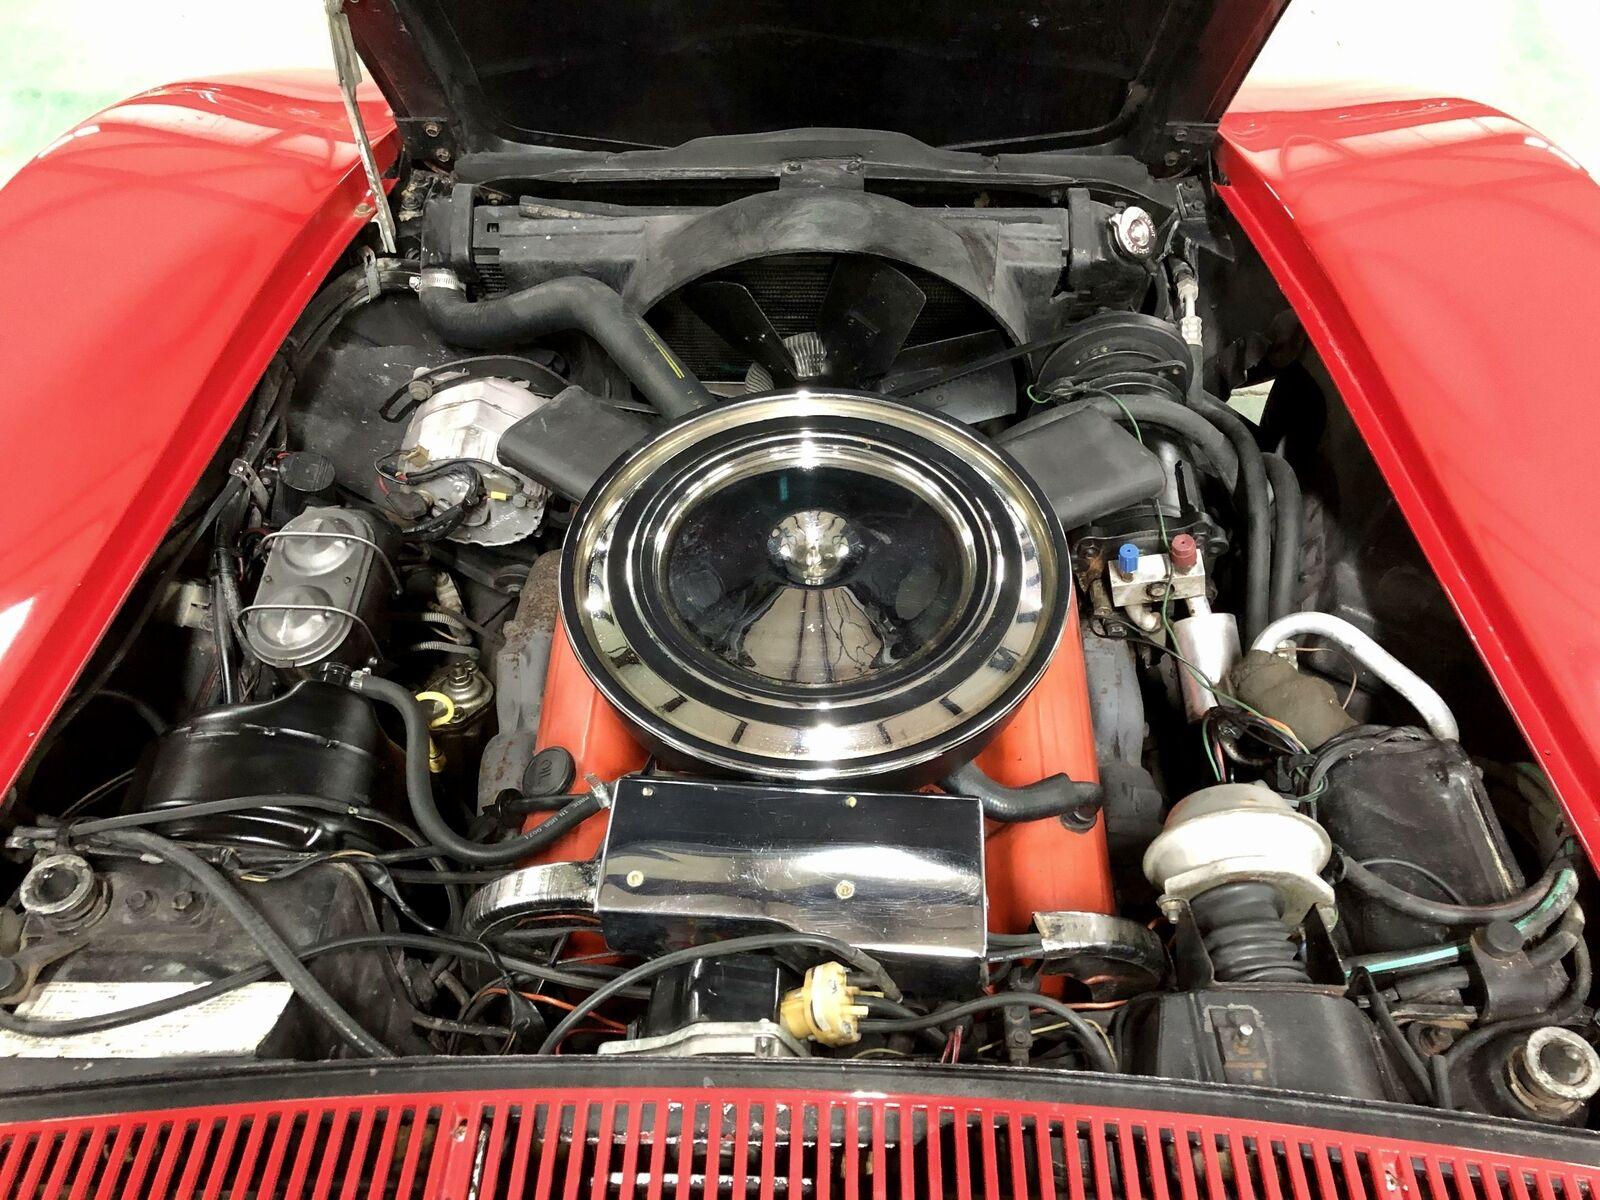 1972 Red Chevrolet Corvette     C3 Corvette Photo 10